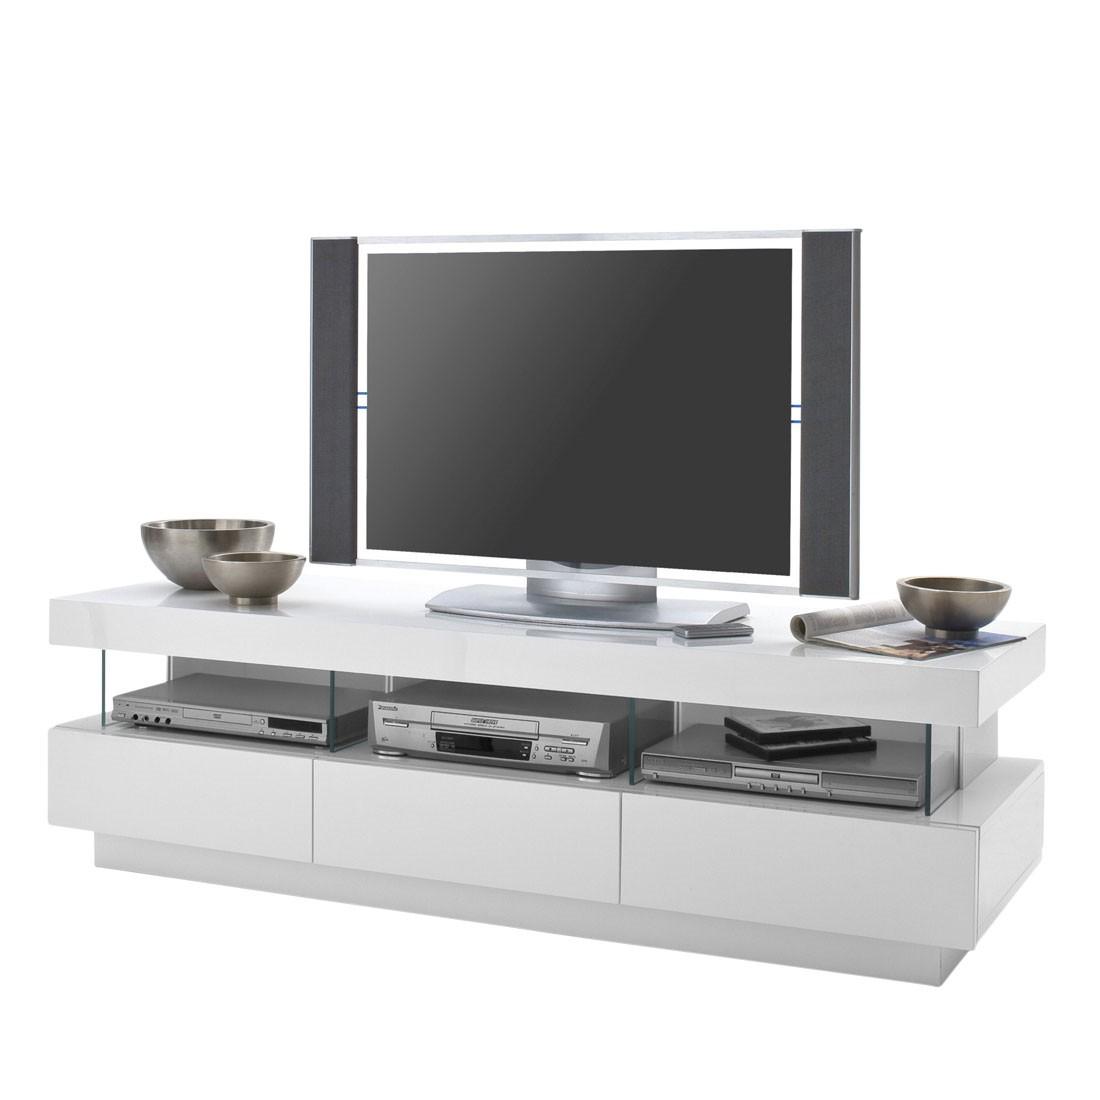 Meuble Tv Avec Paroi Fenrez Com Sammlung Von Design  # Meuble Tv Avec Paroi